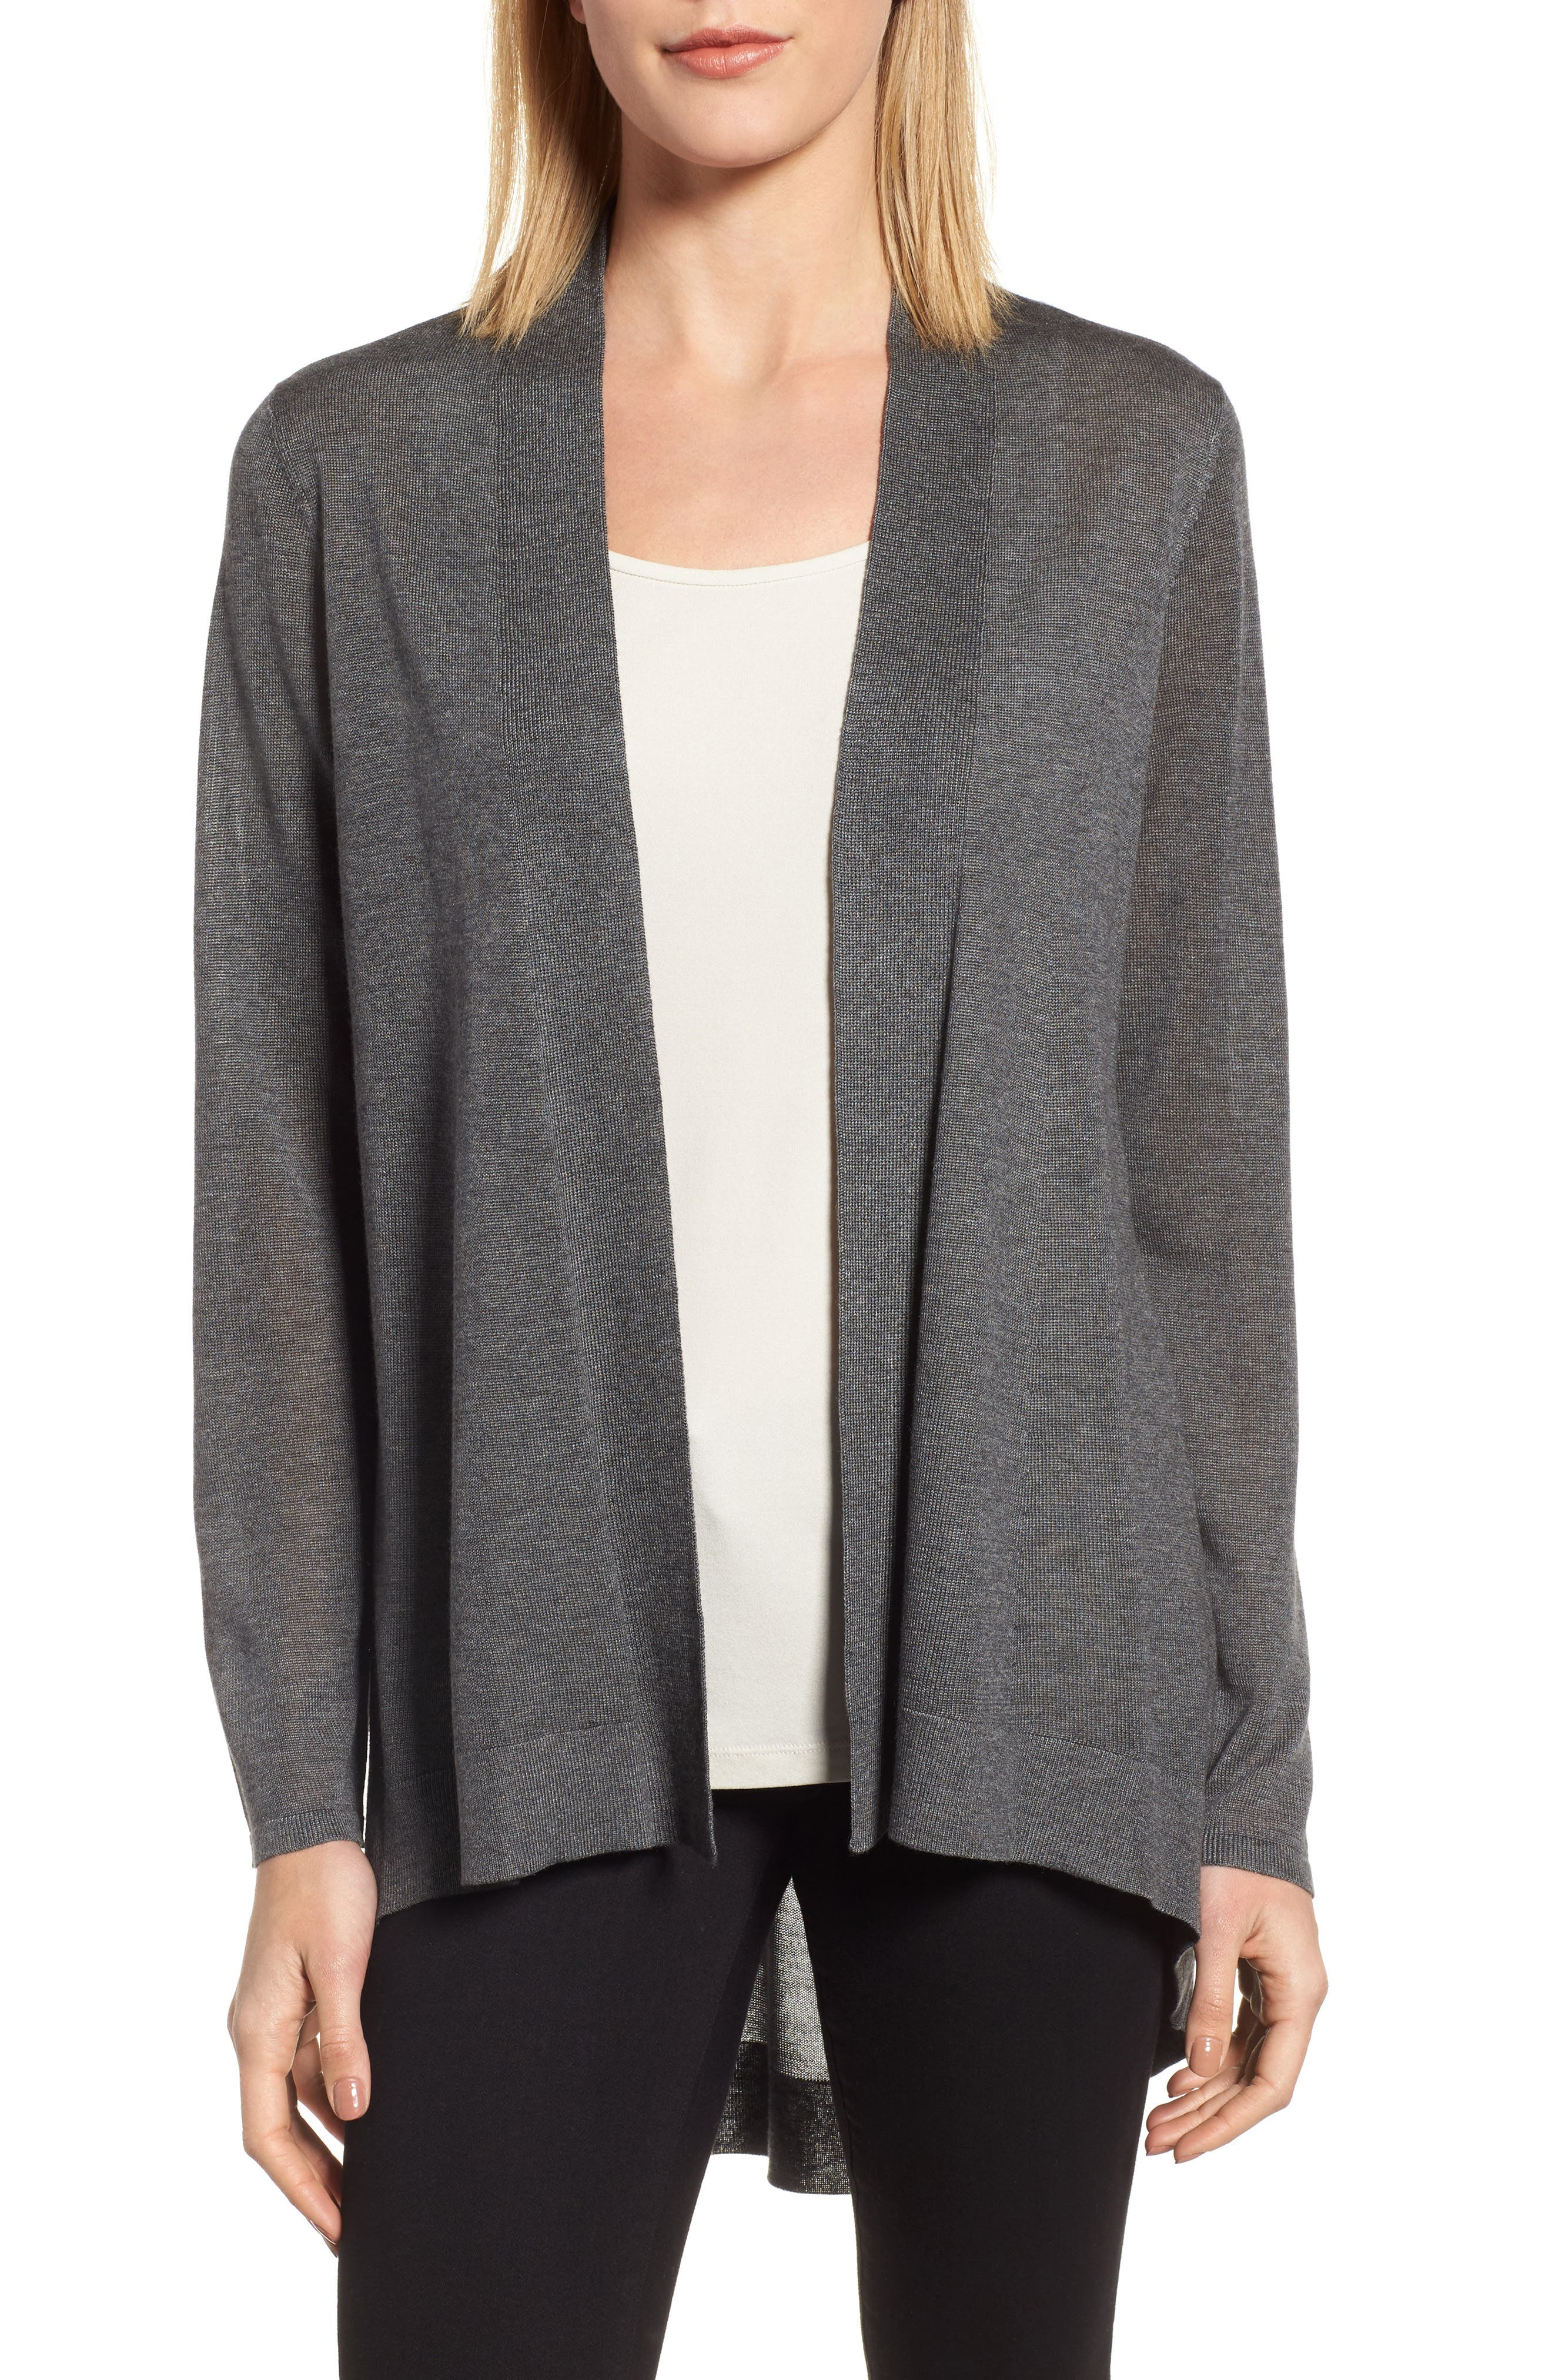 Tencel<sup>®</sup> Lyocell & Merino Wool Shaped Cardigan,                         Main,                         color, 030